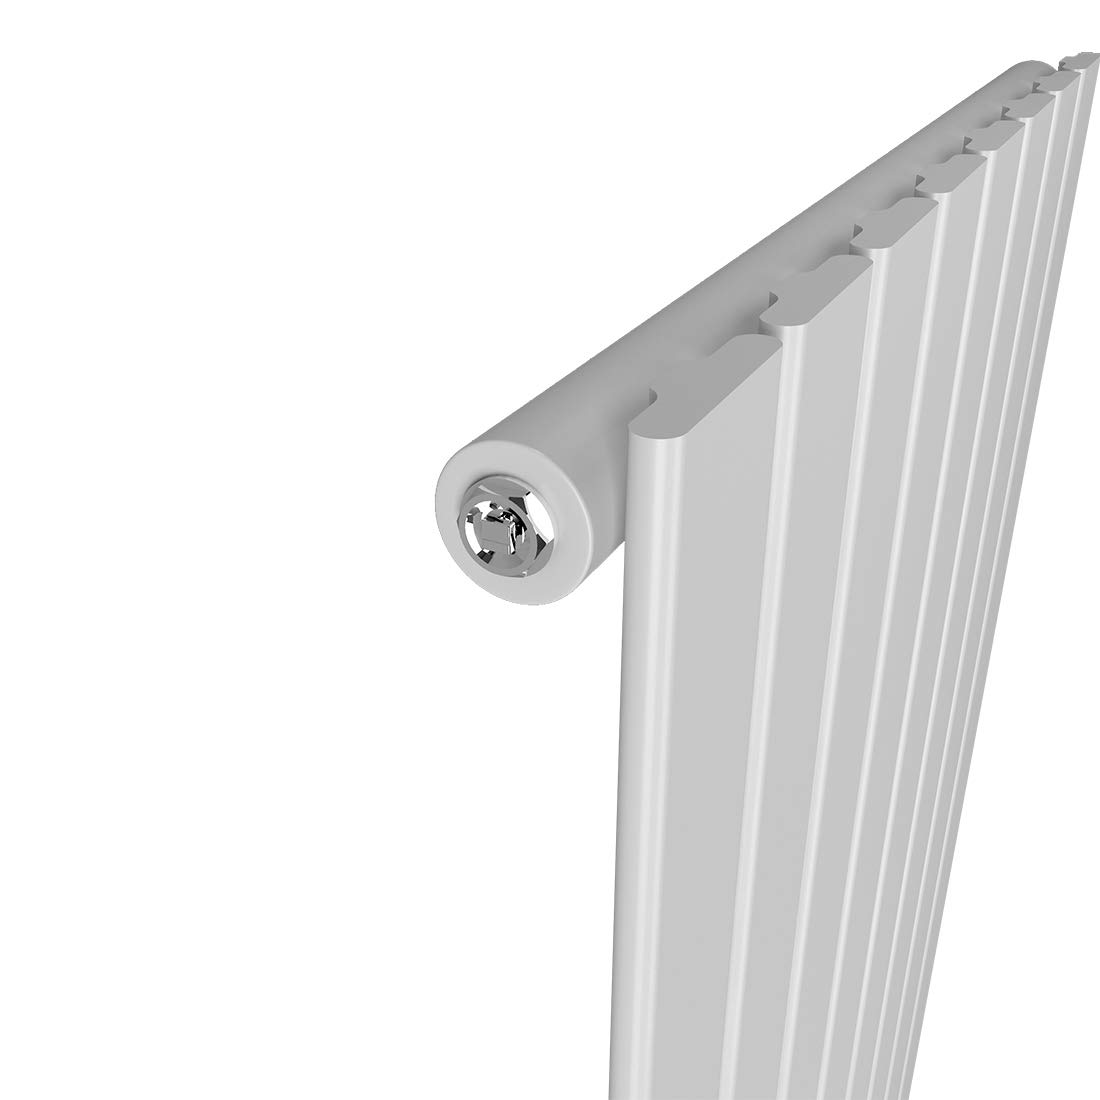 Wei/ß Meykoe Heizk/örper Flach 1800x500mm PaneelHeizk/örper Design Heizung Vertikal Doppellagig Mittelanschluss